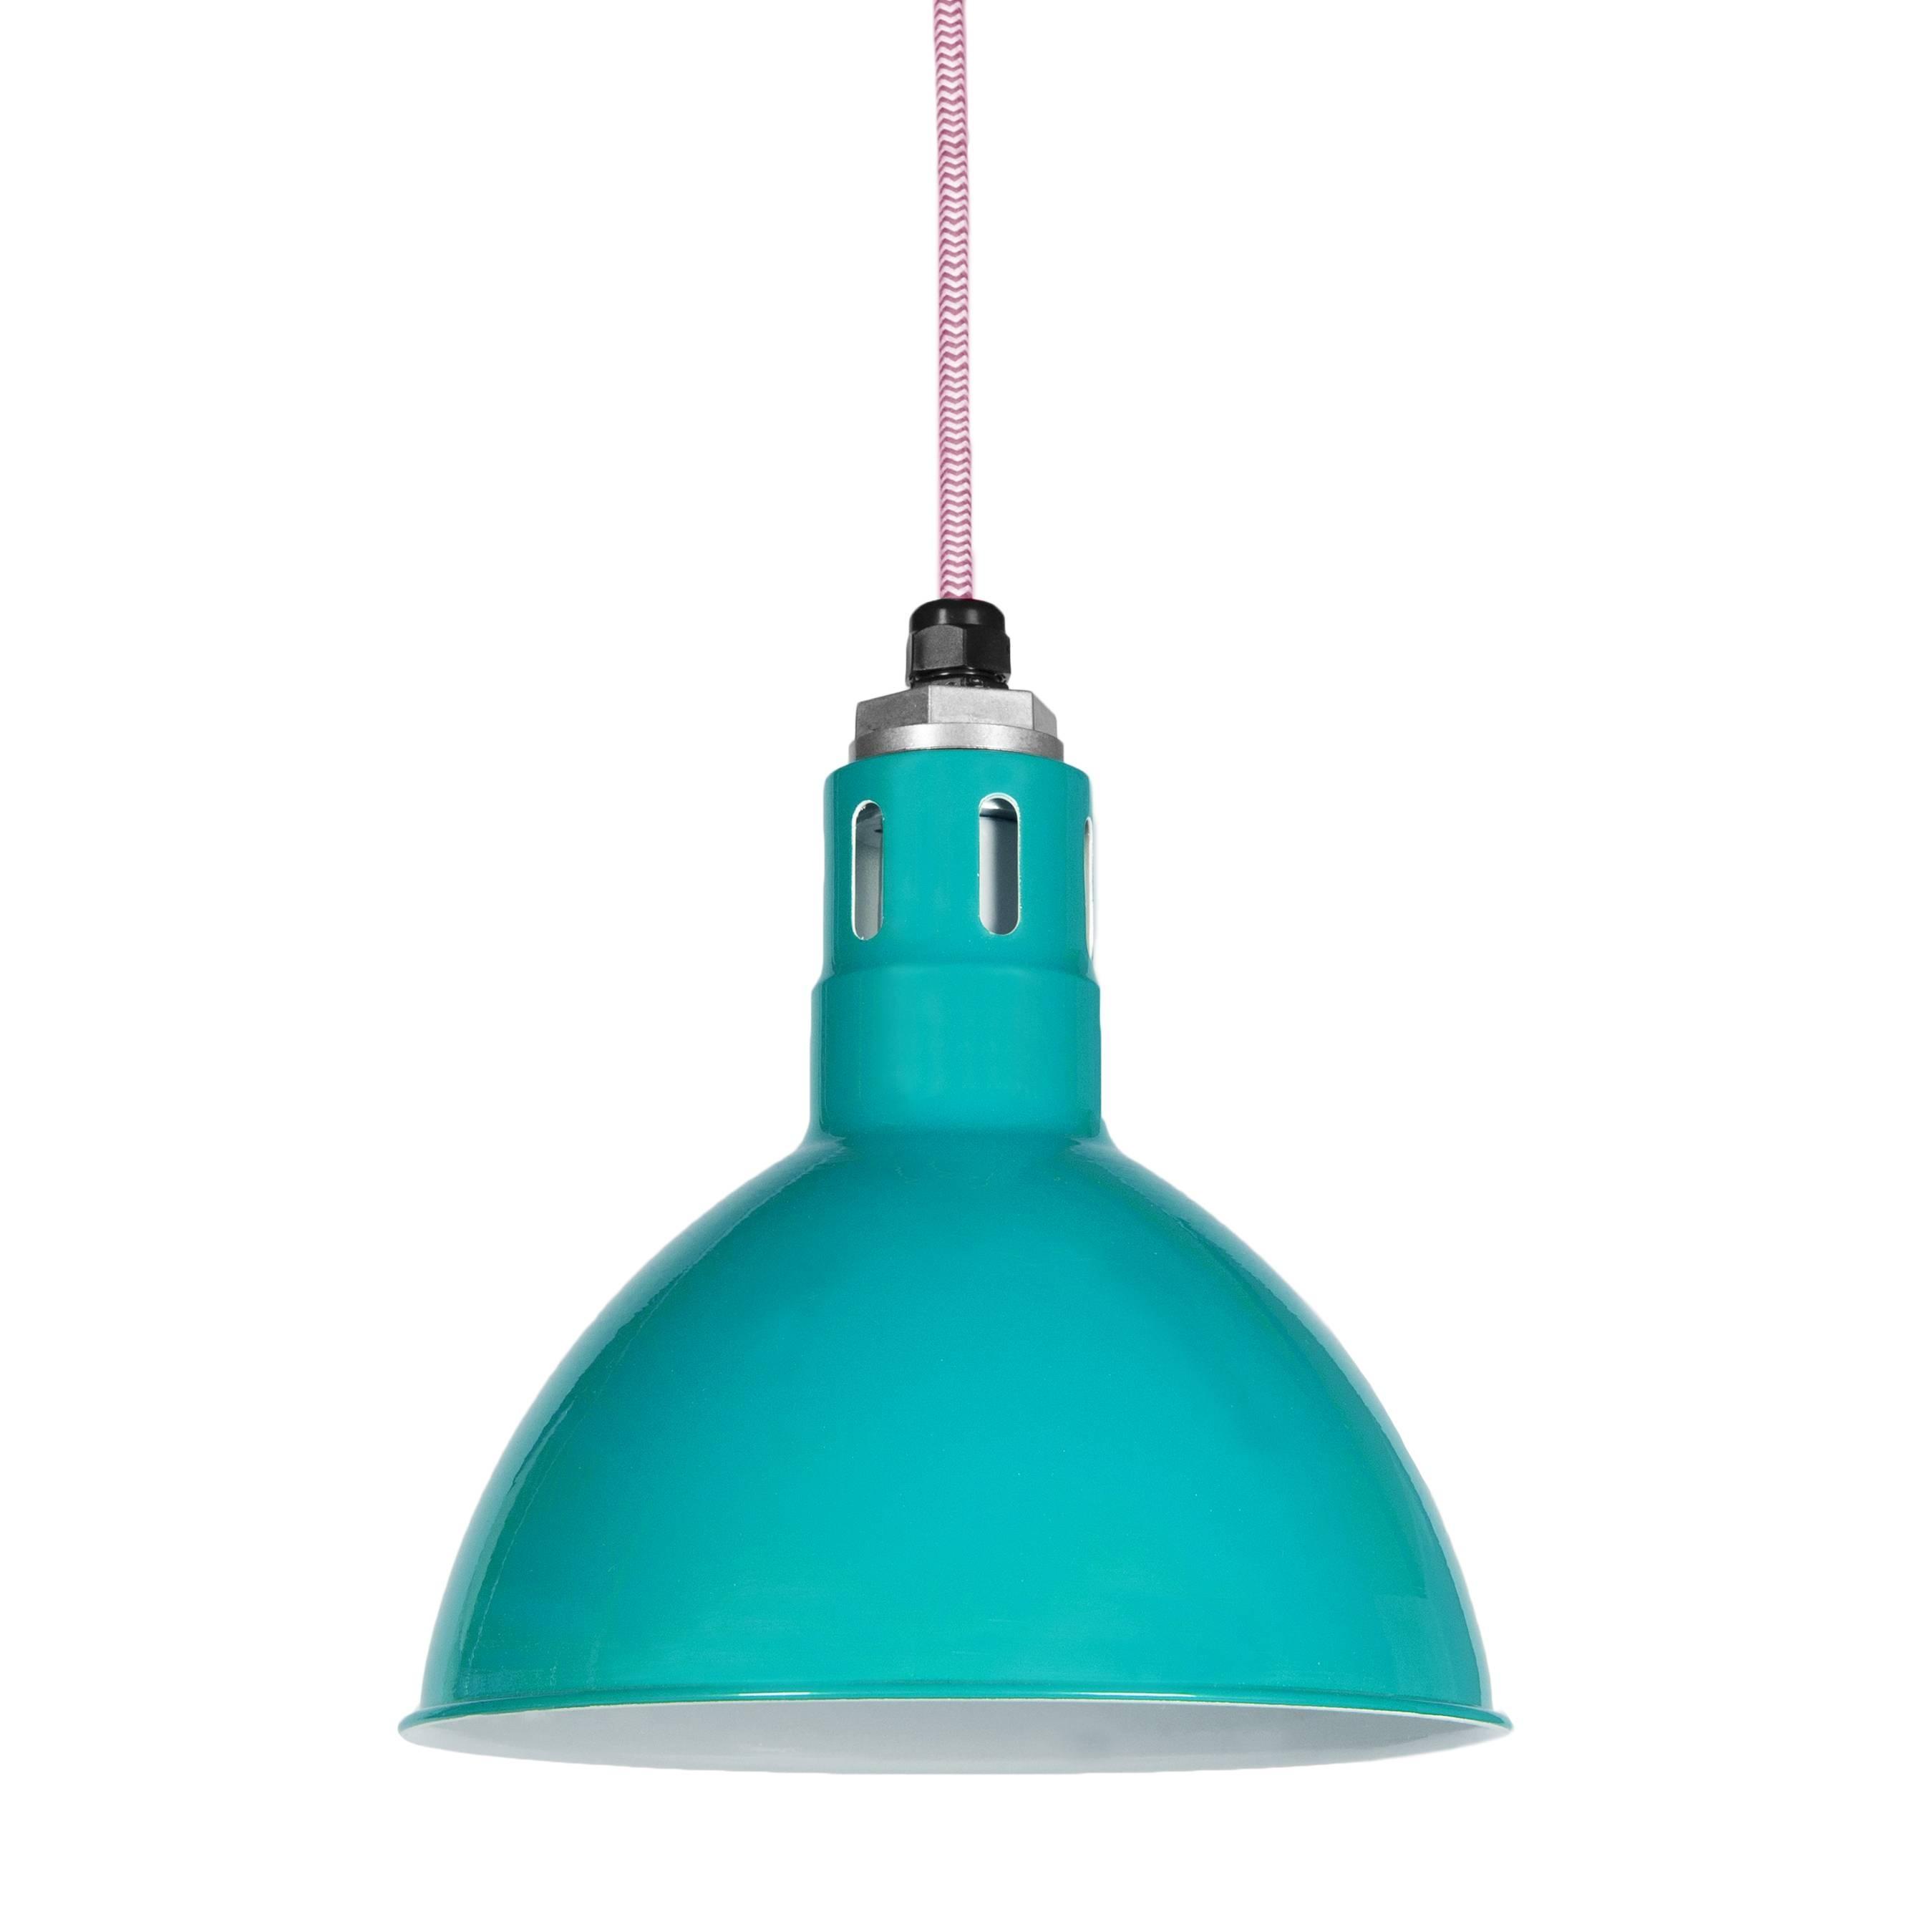 Stunning Teal Pendant Light For Home Decorating Ideas Pendant In Blue Pendant Light Fixtures (View 15 of 15)